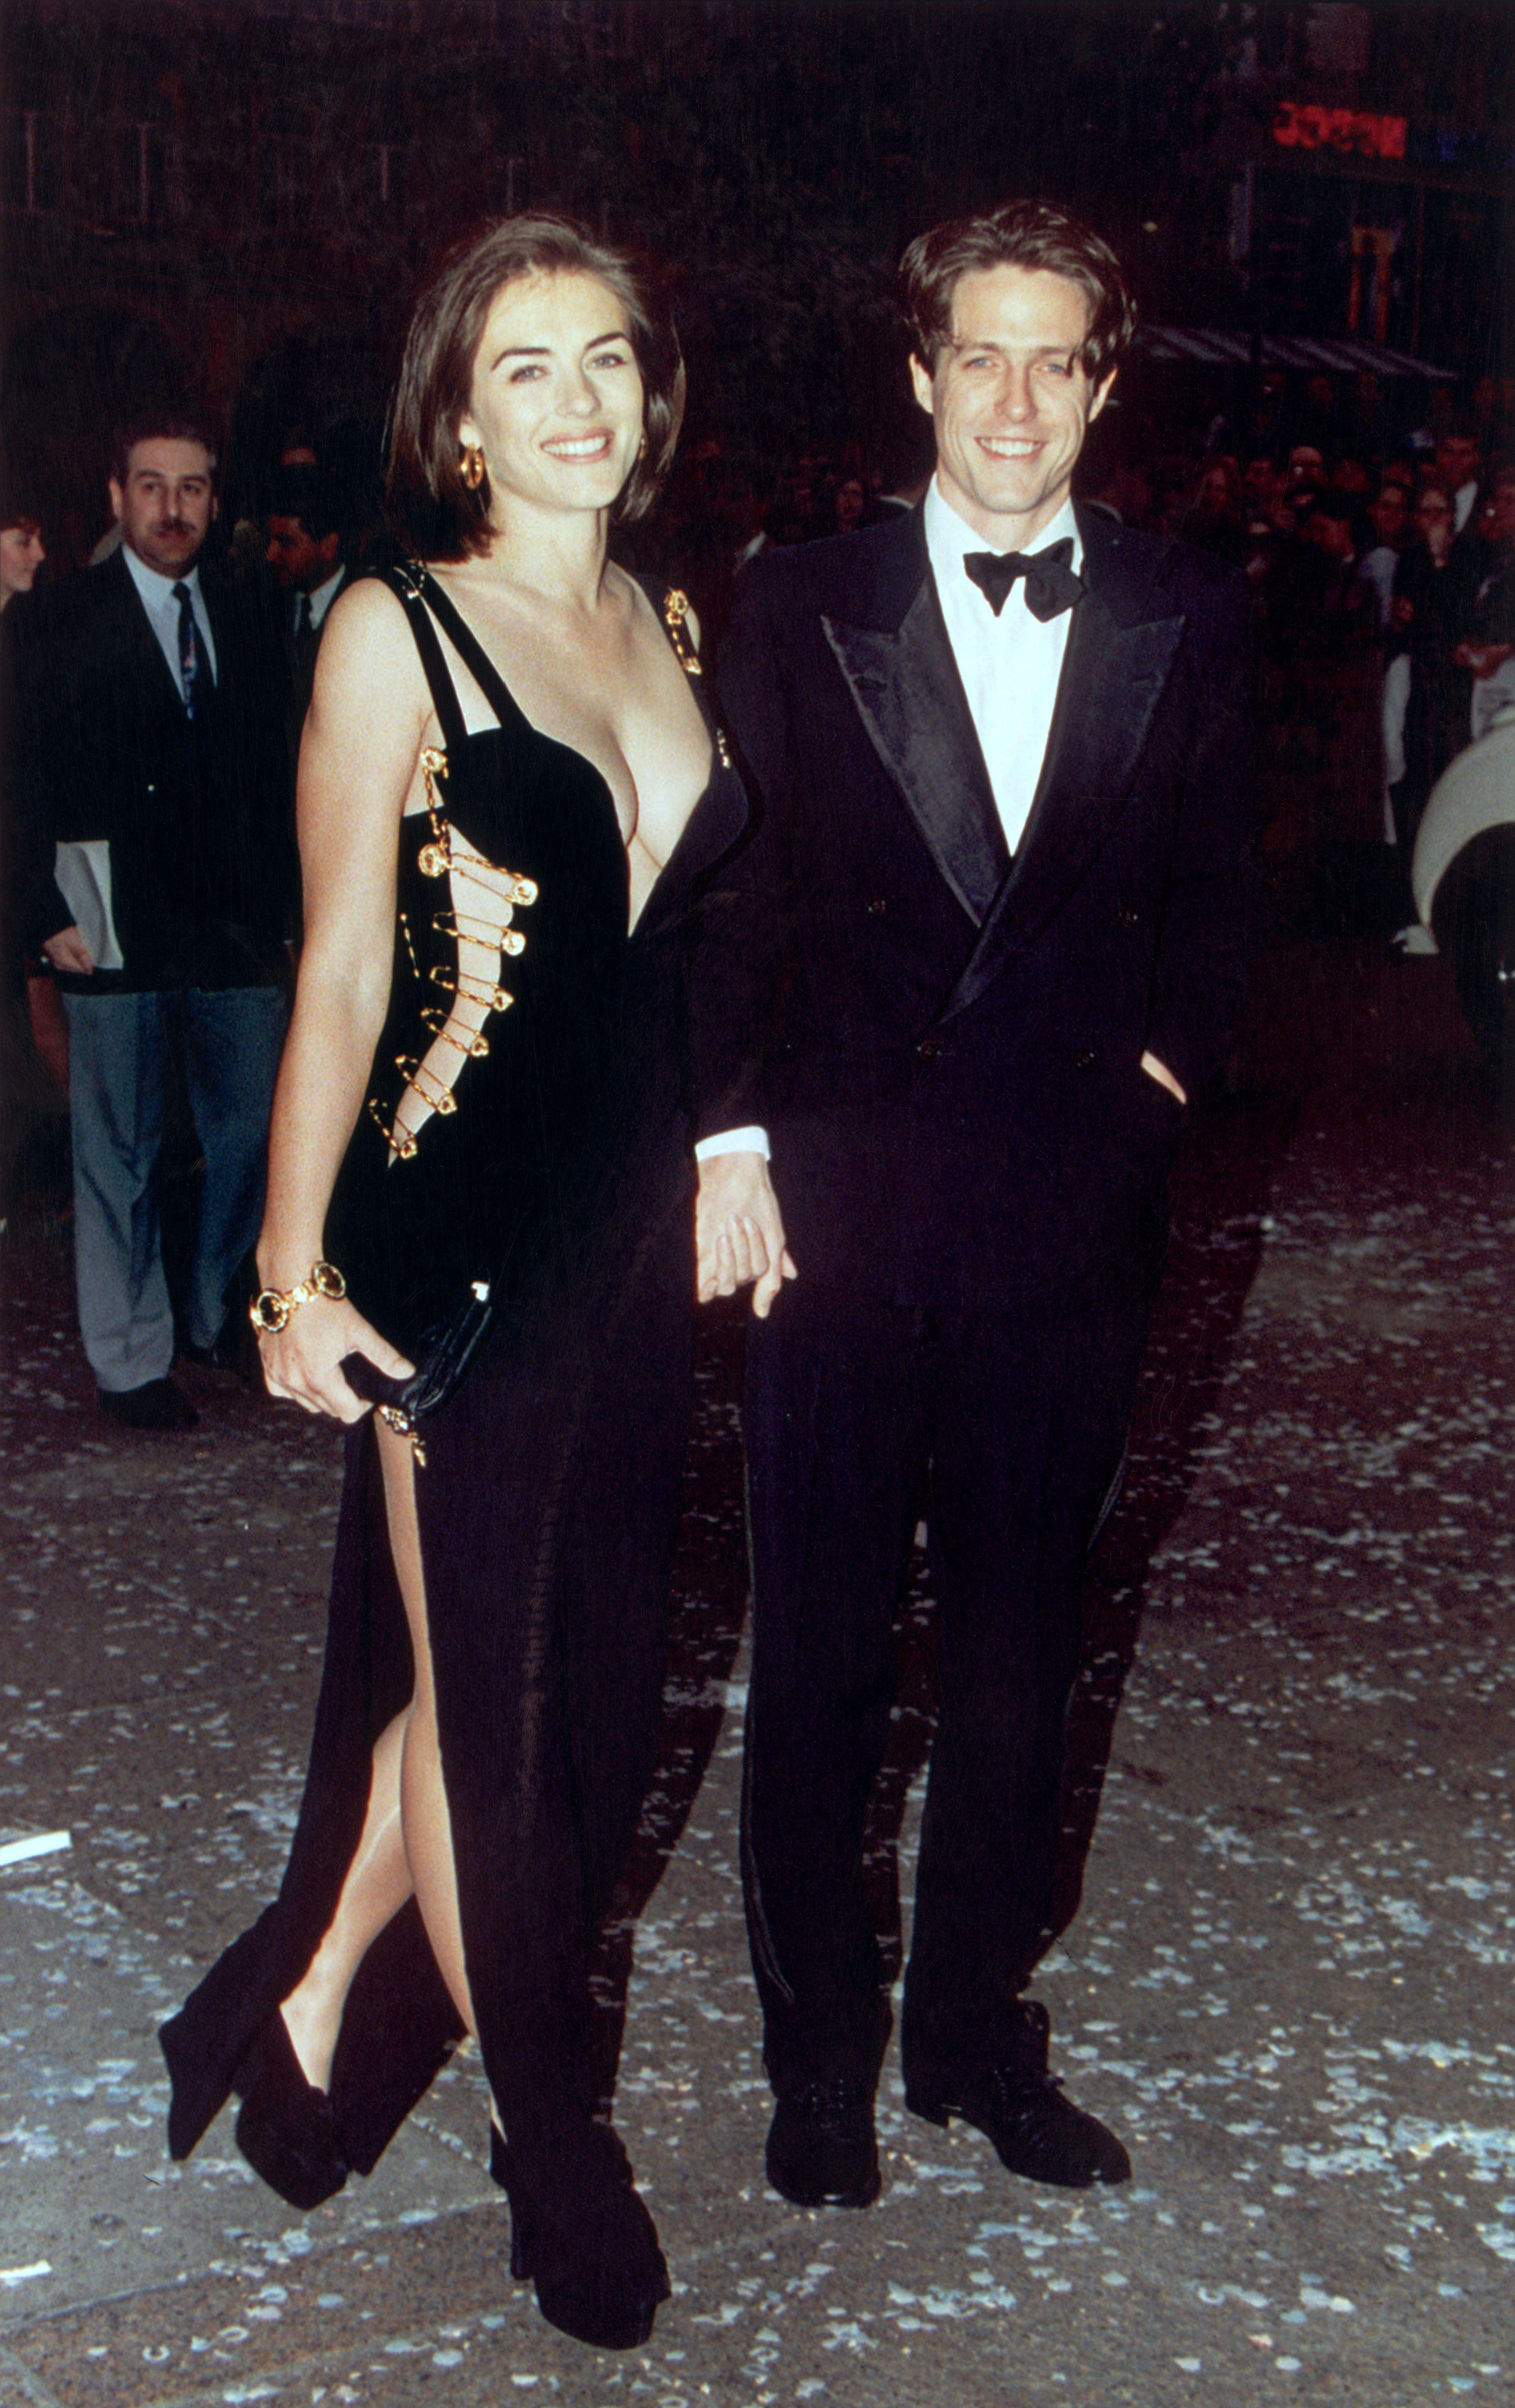 Elizabeth Hurley 1994 In 2020 Versace Dress Iconic Dresses Elizabeth Hurley